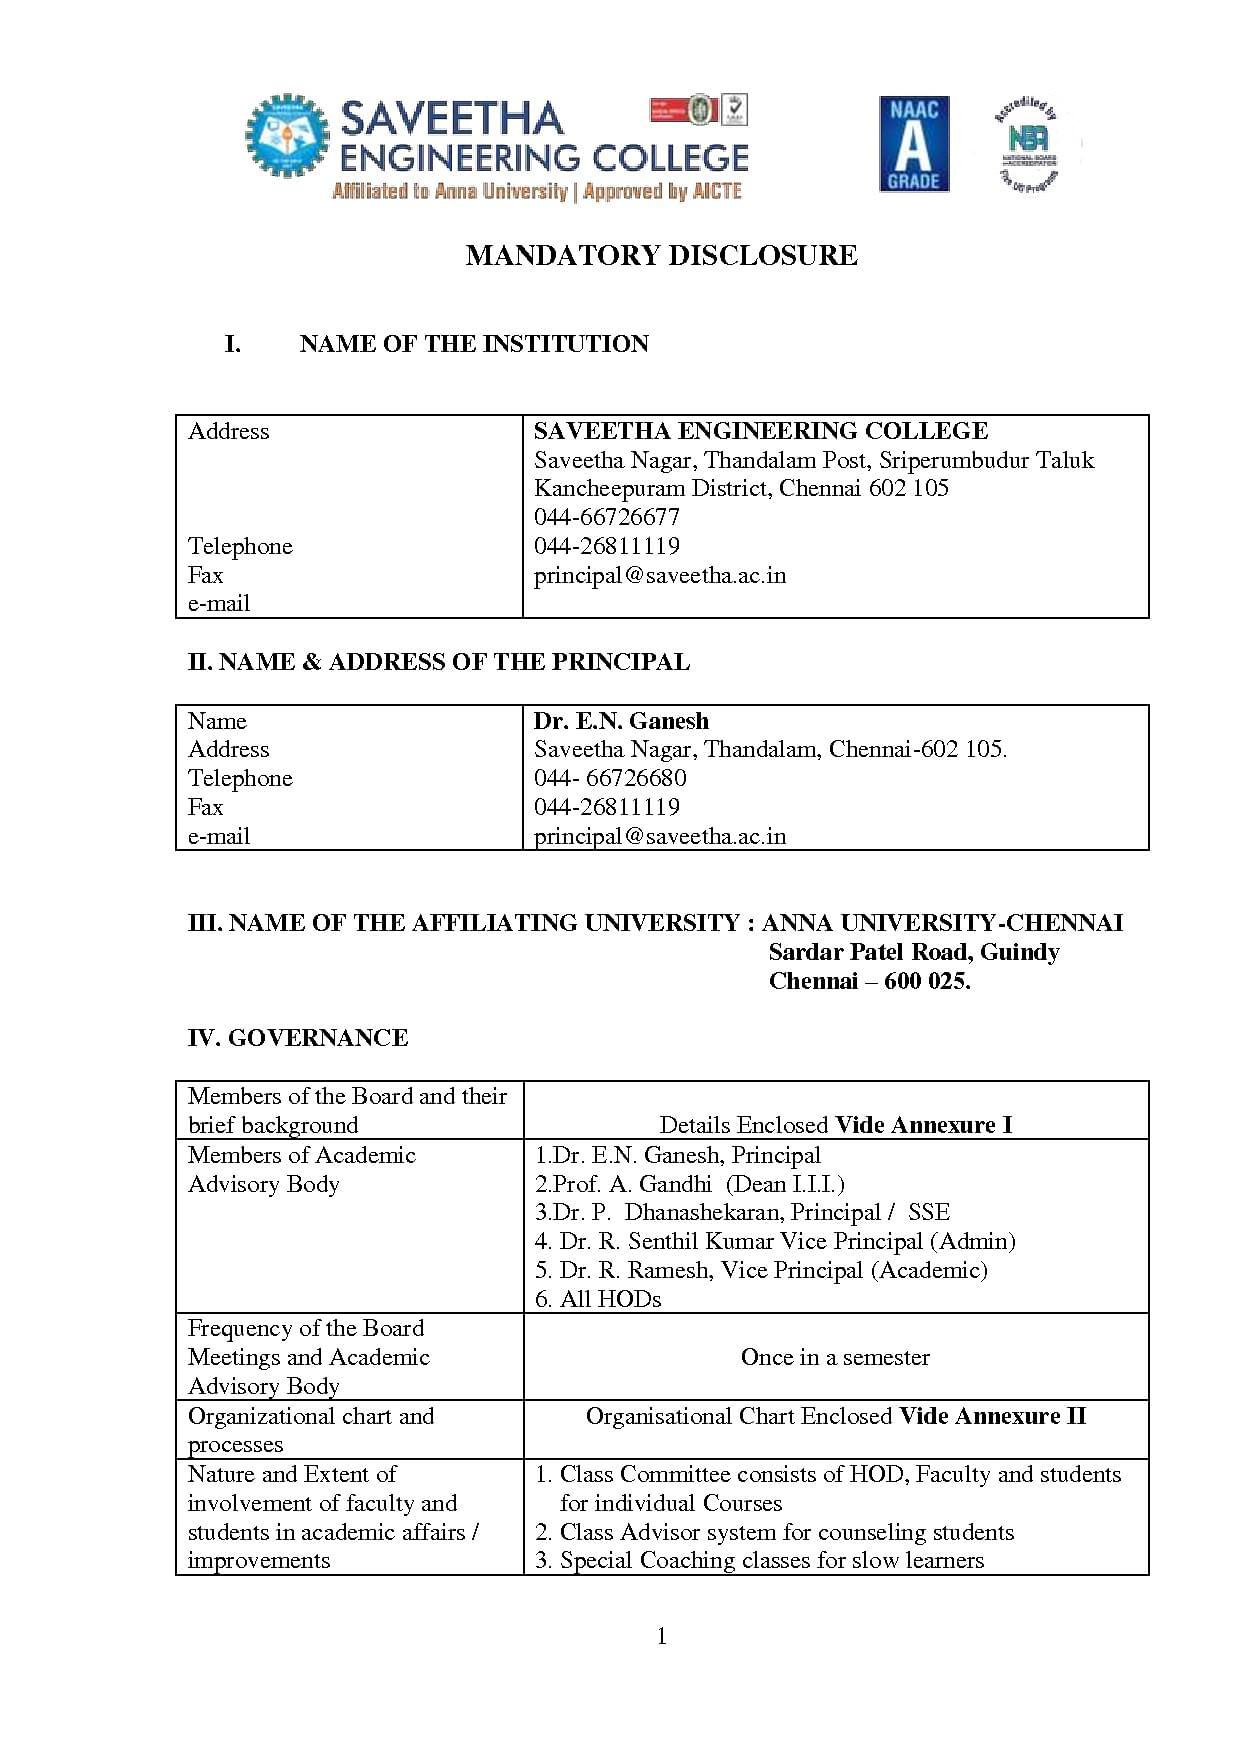 Saveetha Engineering College - [SEC], Chennai - Admissions, Contact